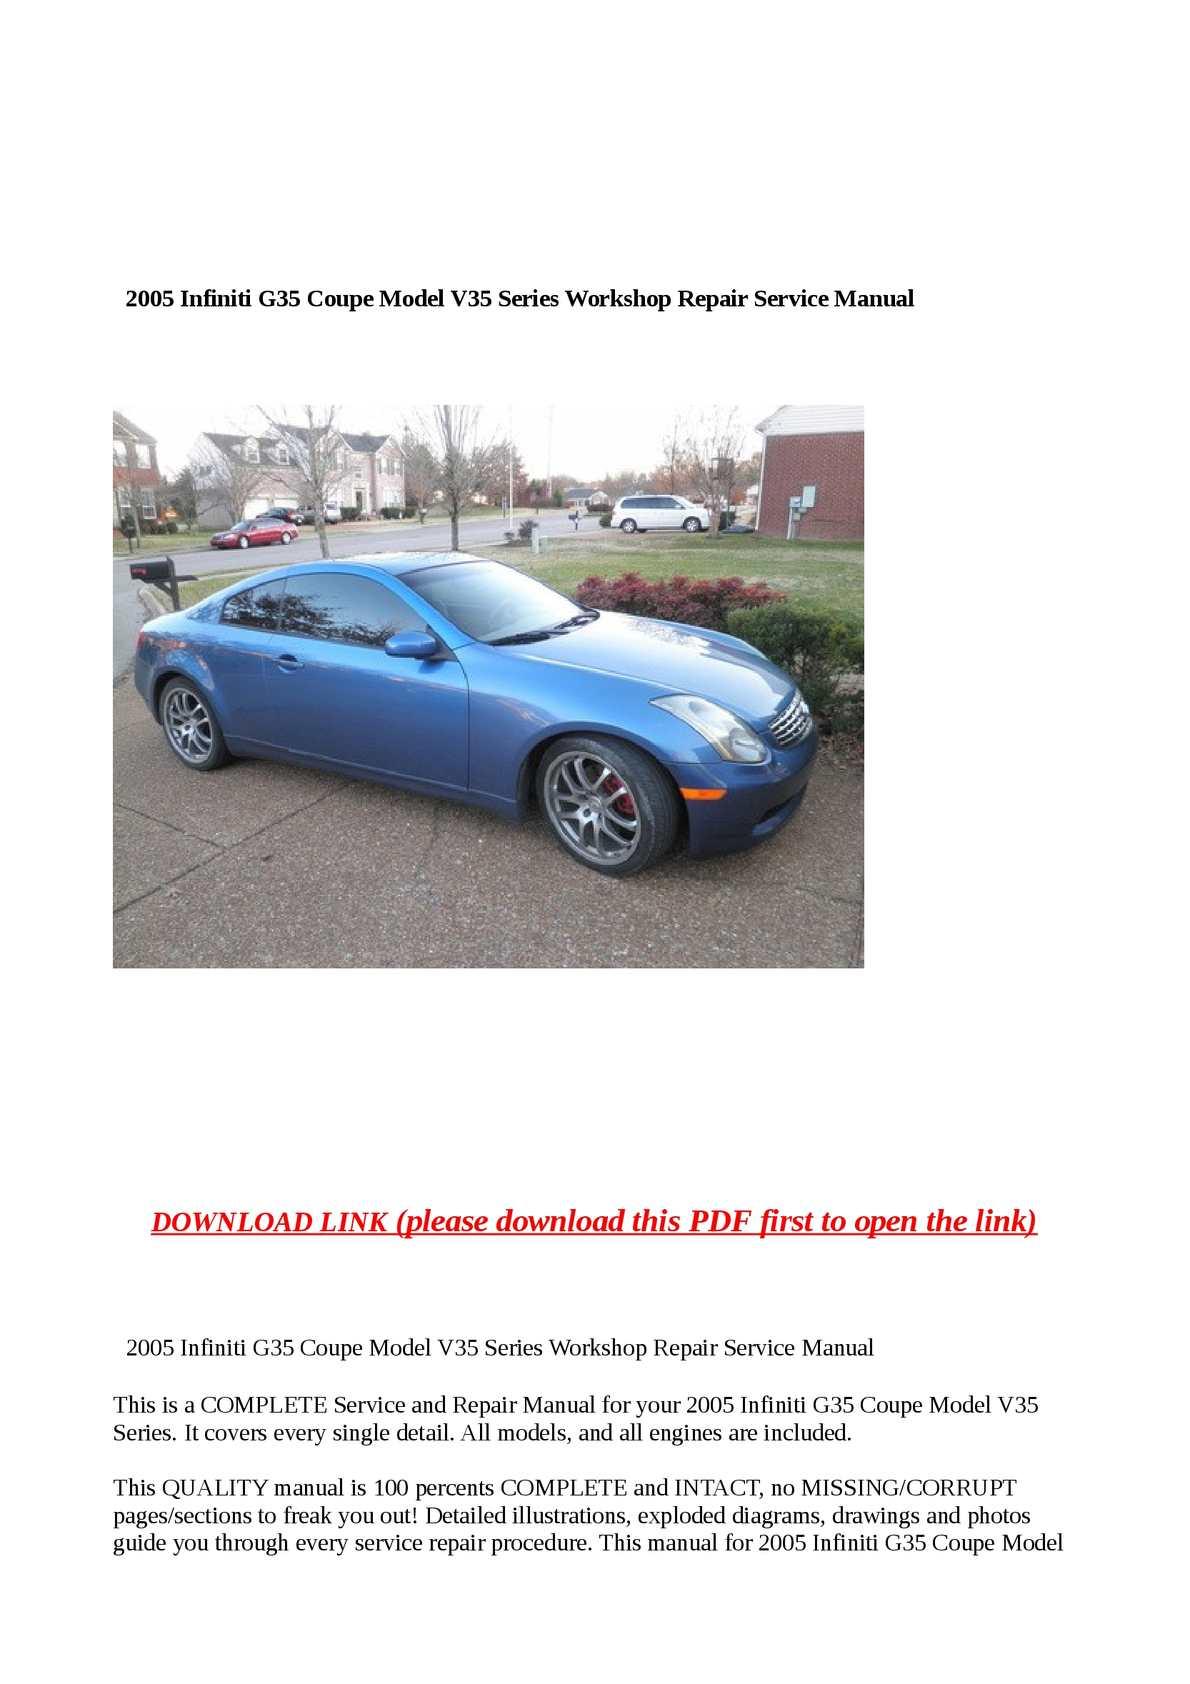 2005 g35 service manual pdf